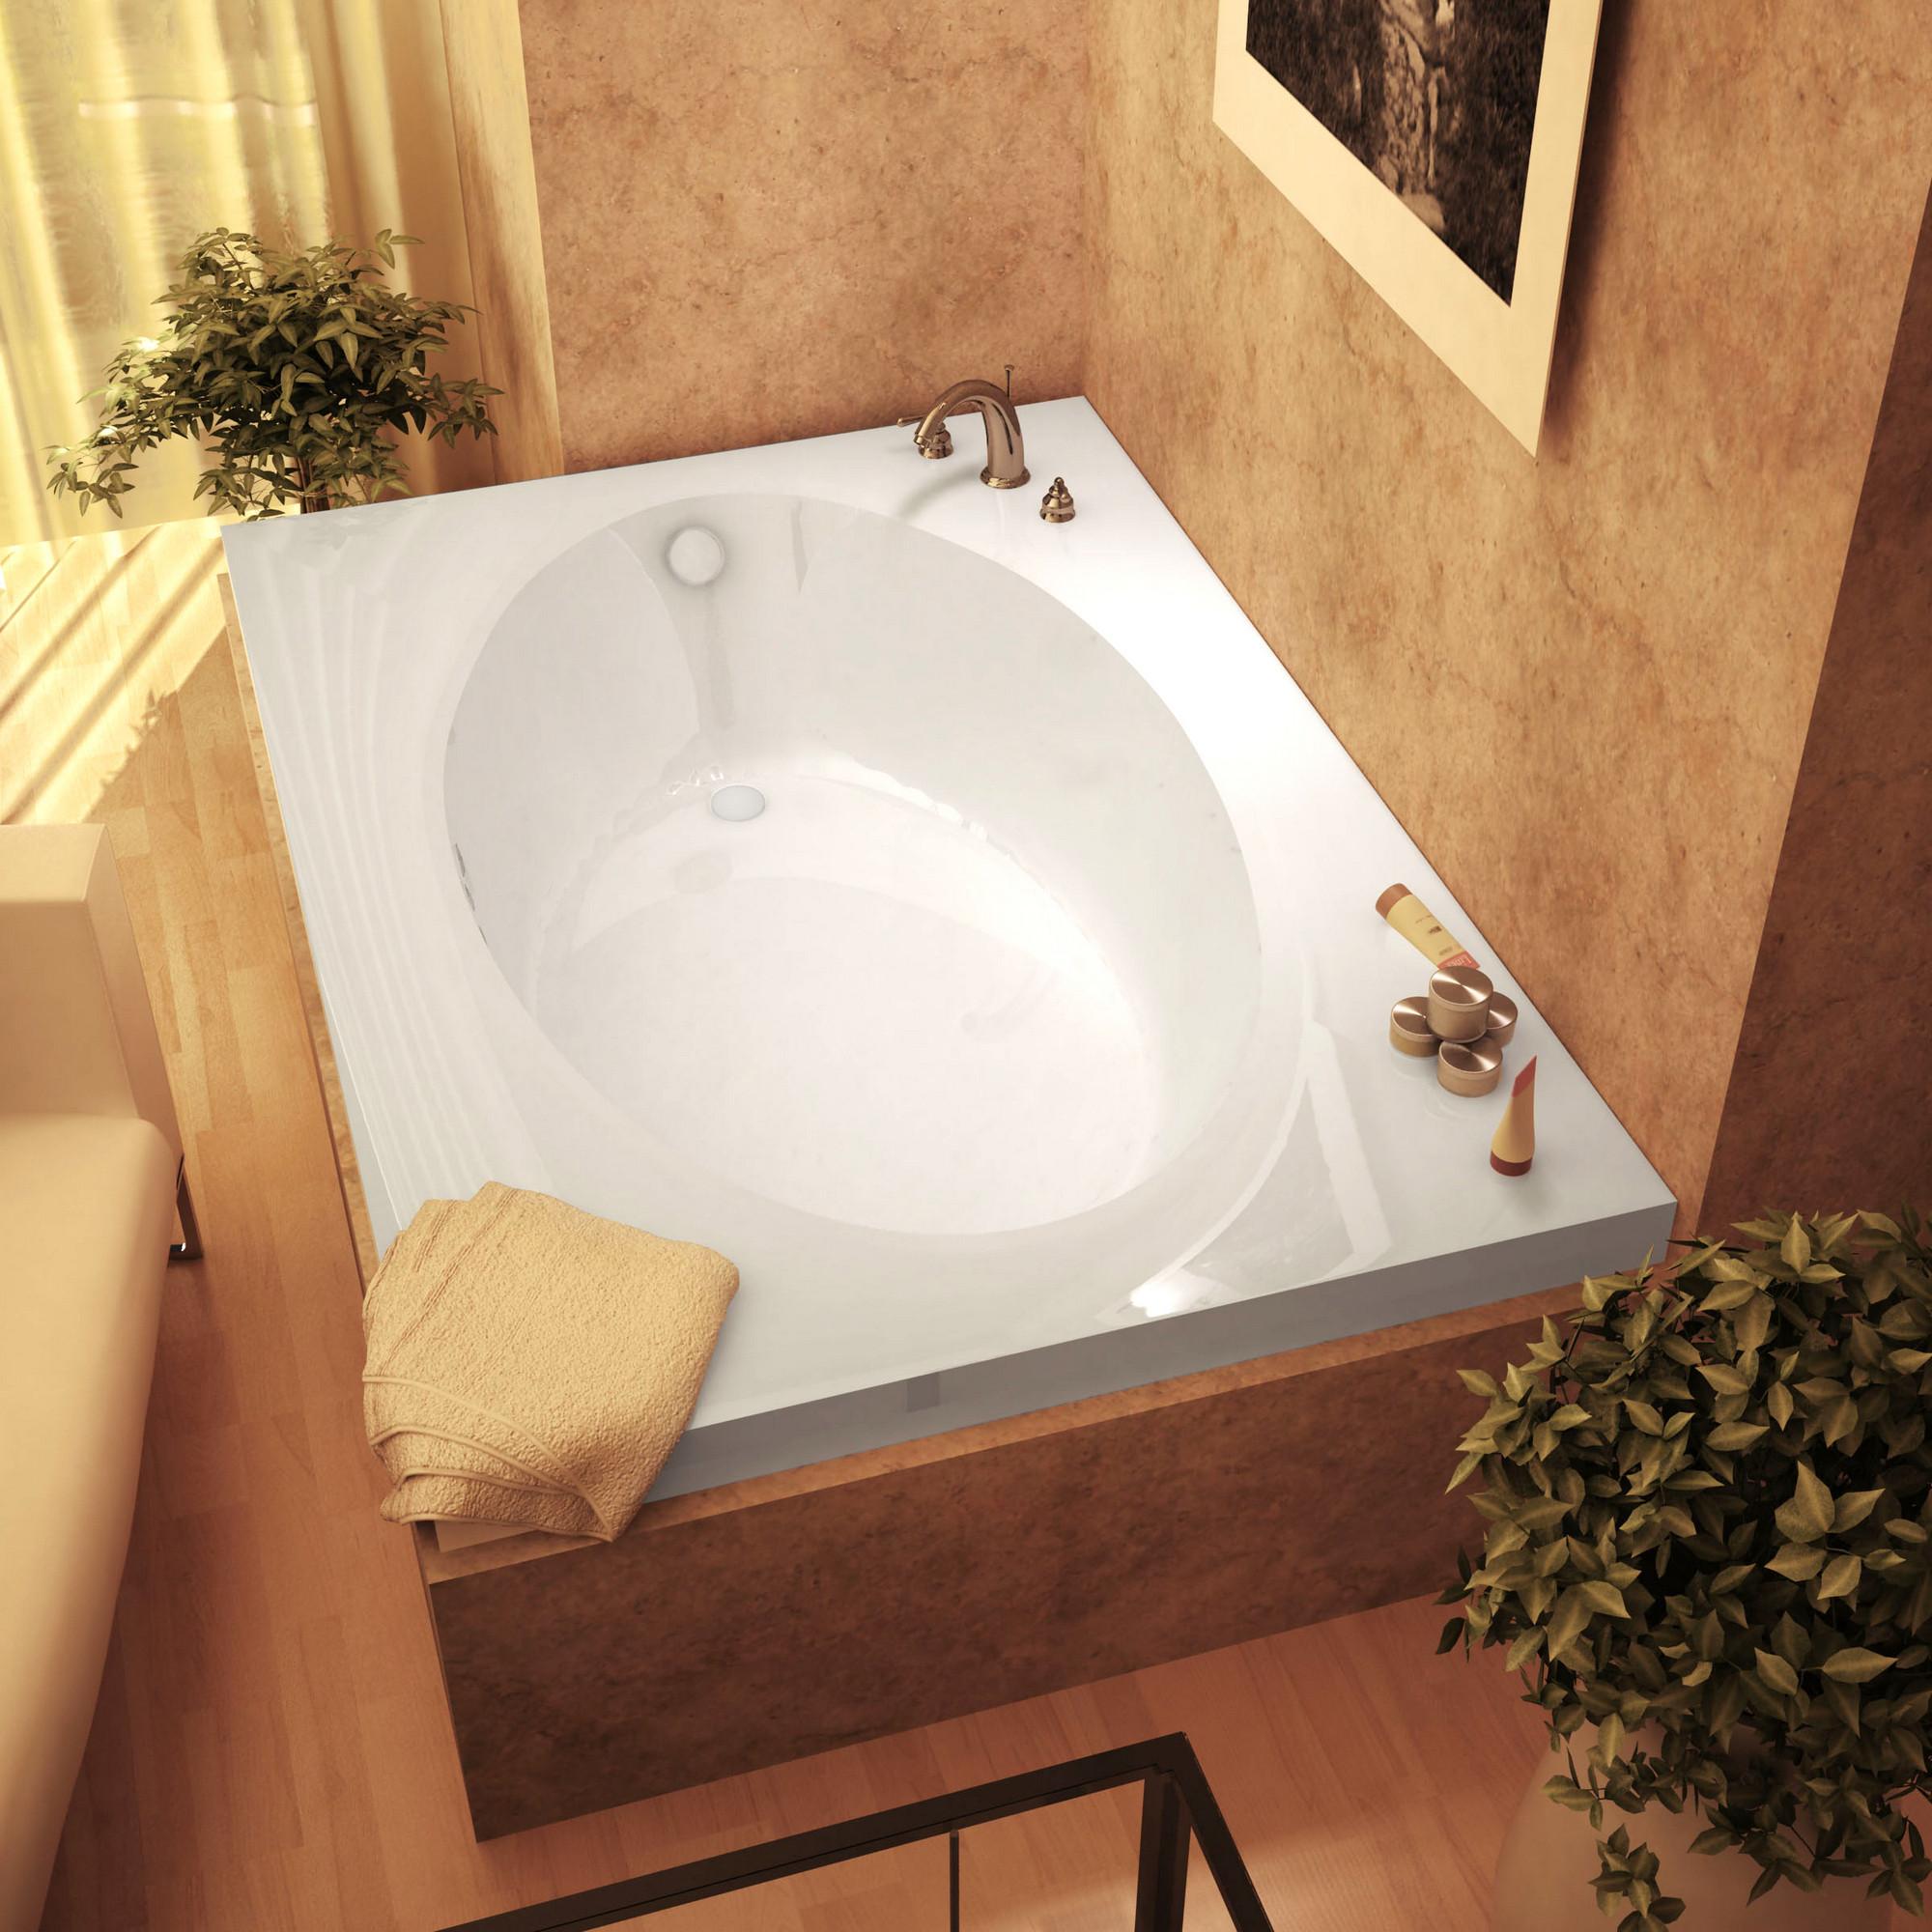 MediTub 4272VC Atlantis Vogue Rectangular Soaking Bathtub With Center Drain